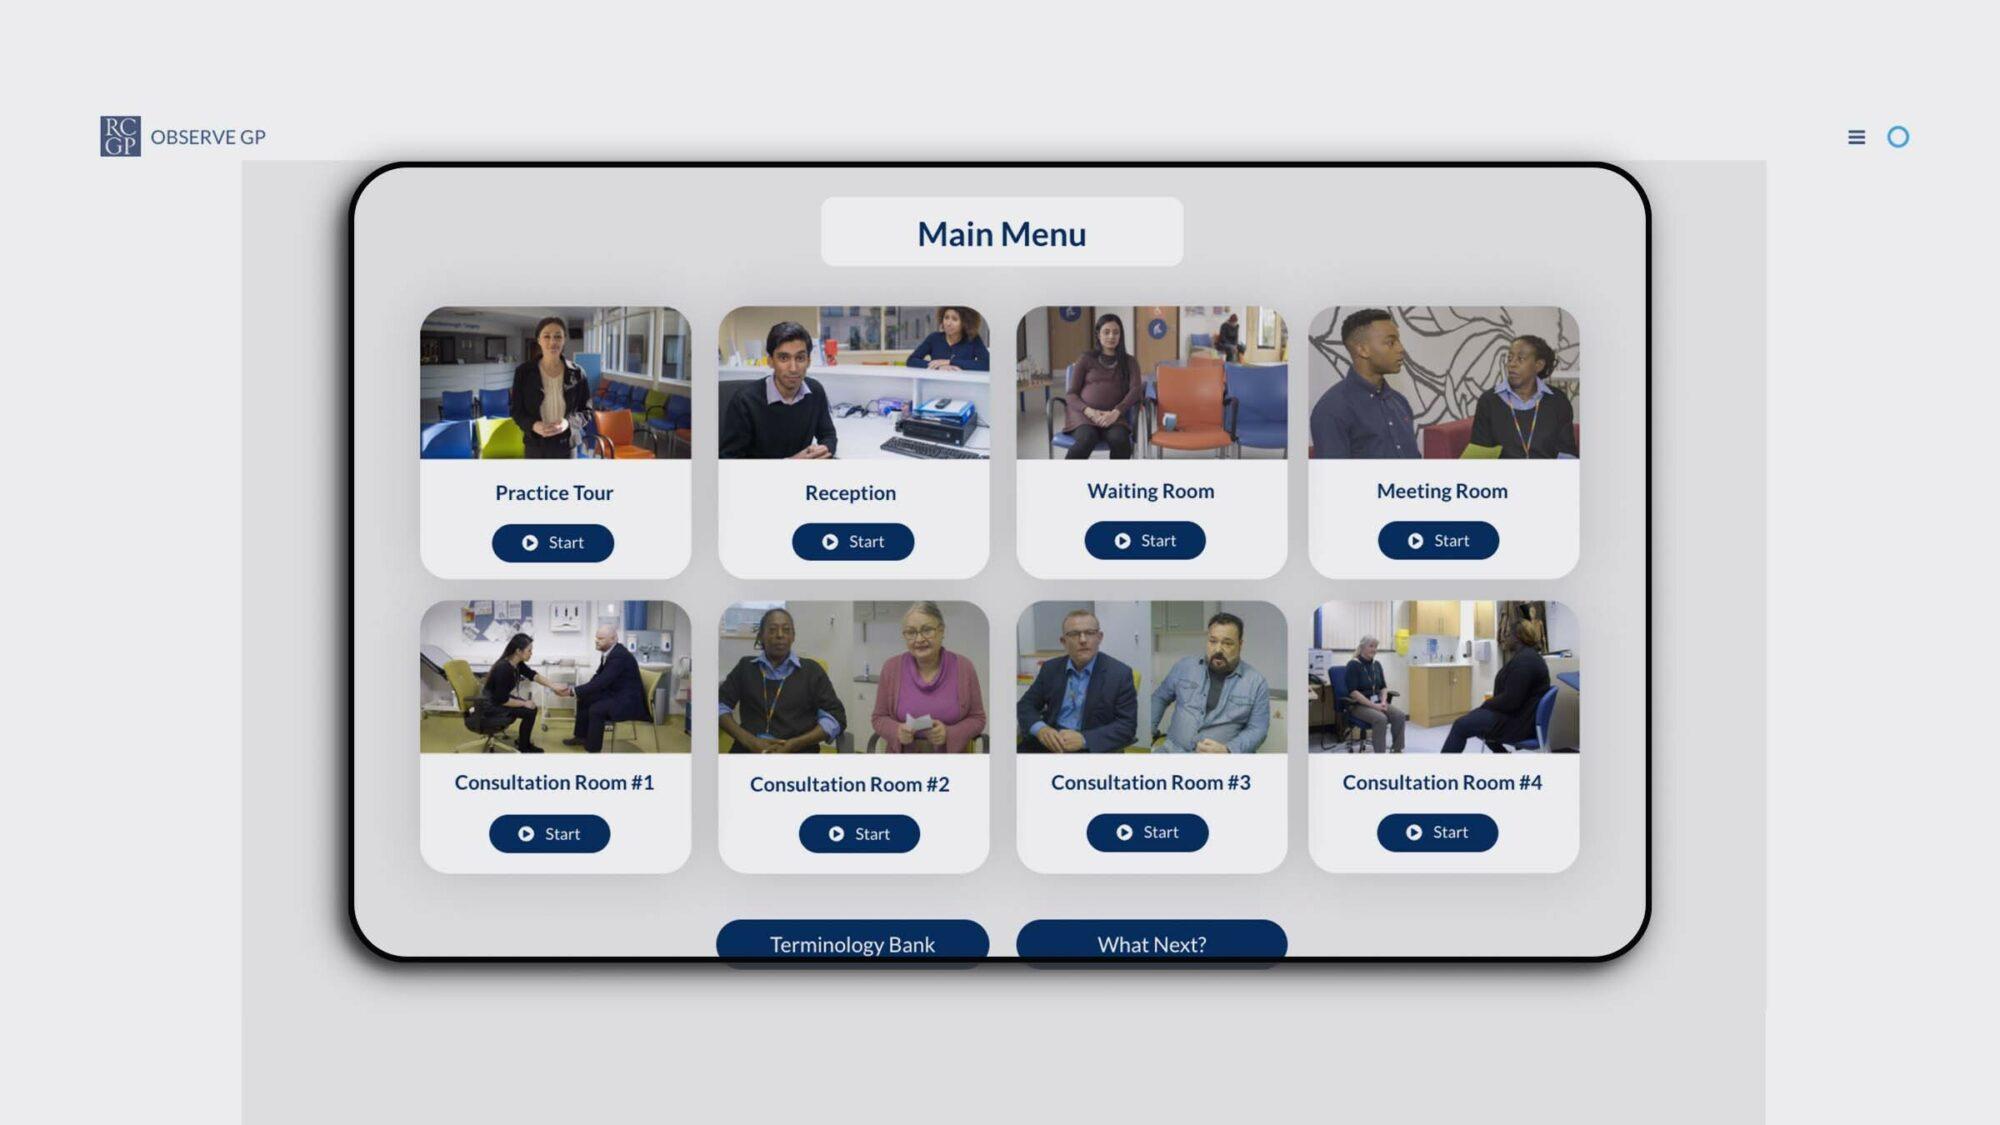 RCGP's e-learning platform to help aspiring medics gain work experience